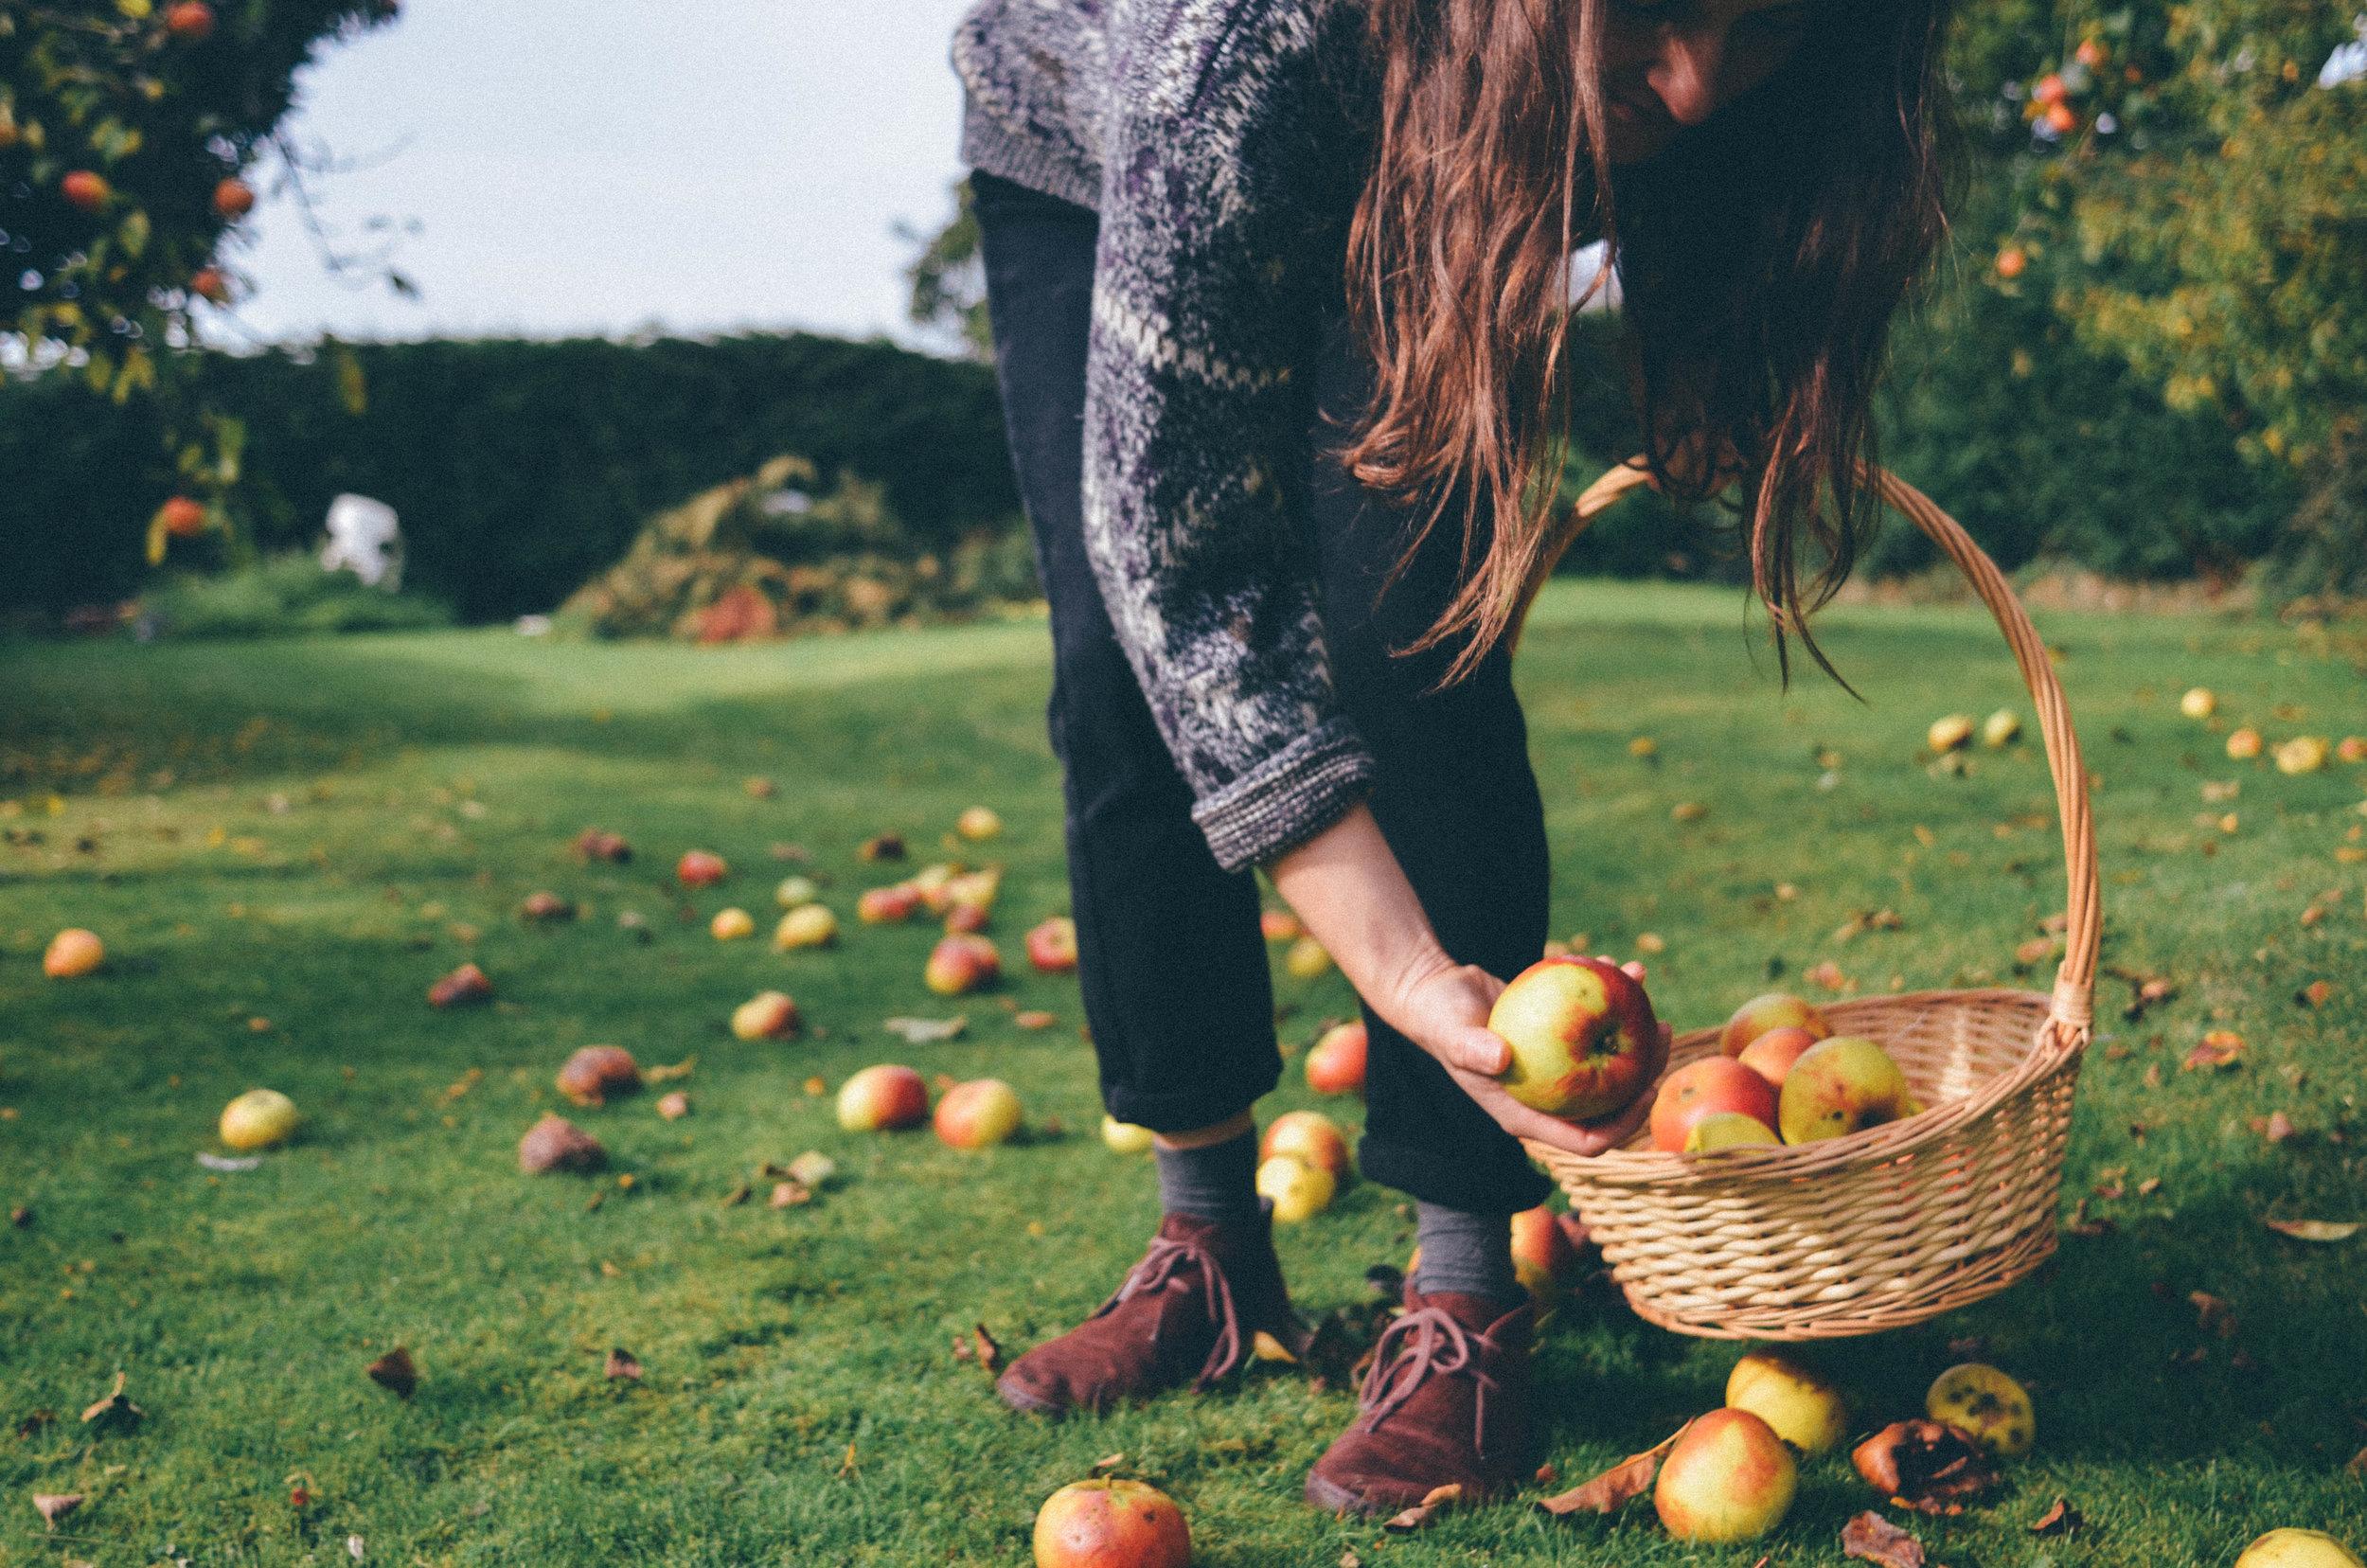 Autumn Apple Picking & Apple Cake Recipe - The Foraged Life